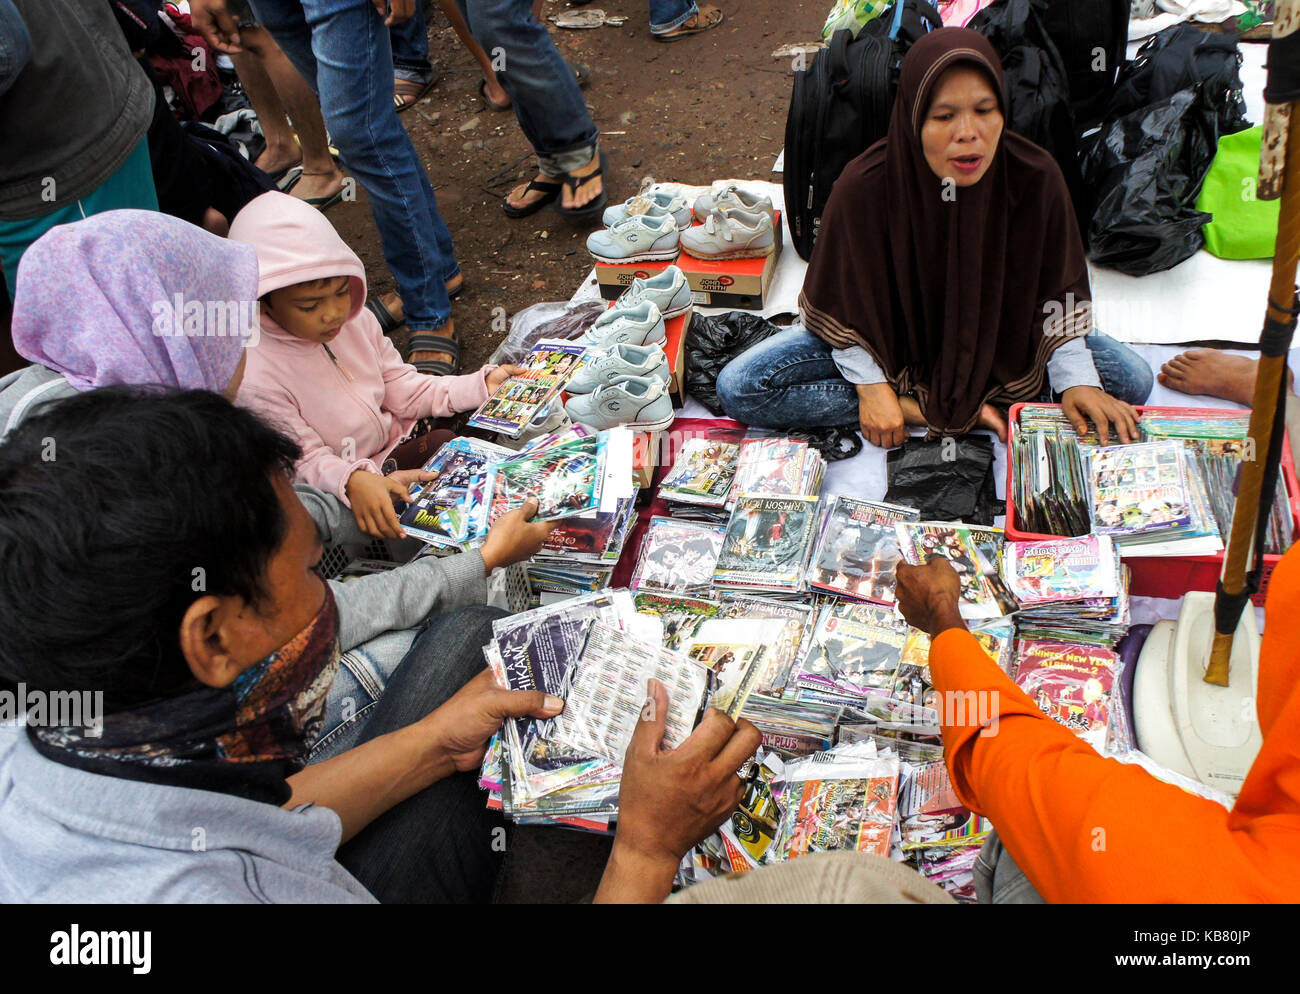 Street vendor sells DVD at used stuff market, Palembang, South Sumatera, Indonesia - Stock Image